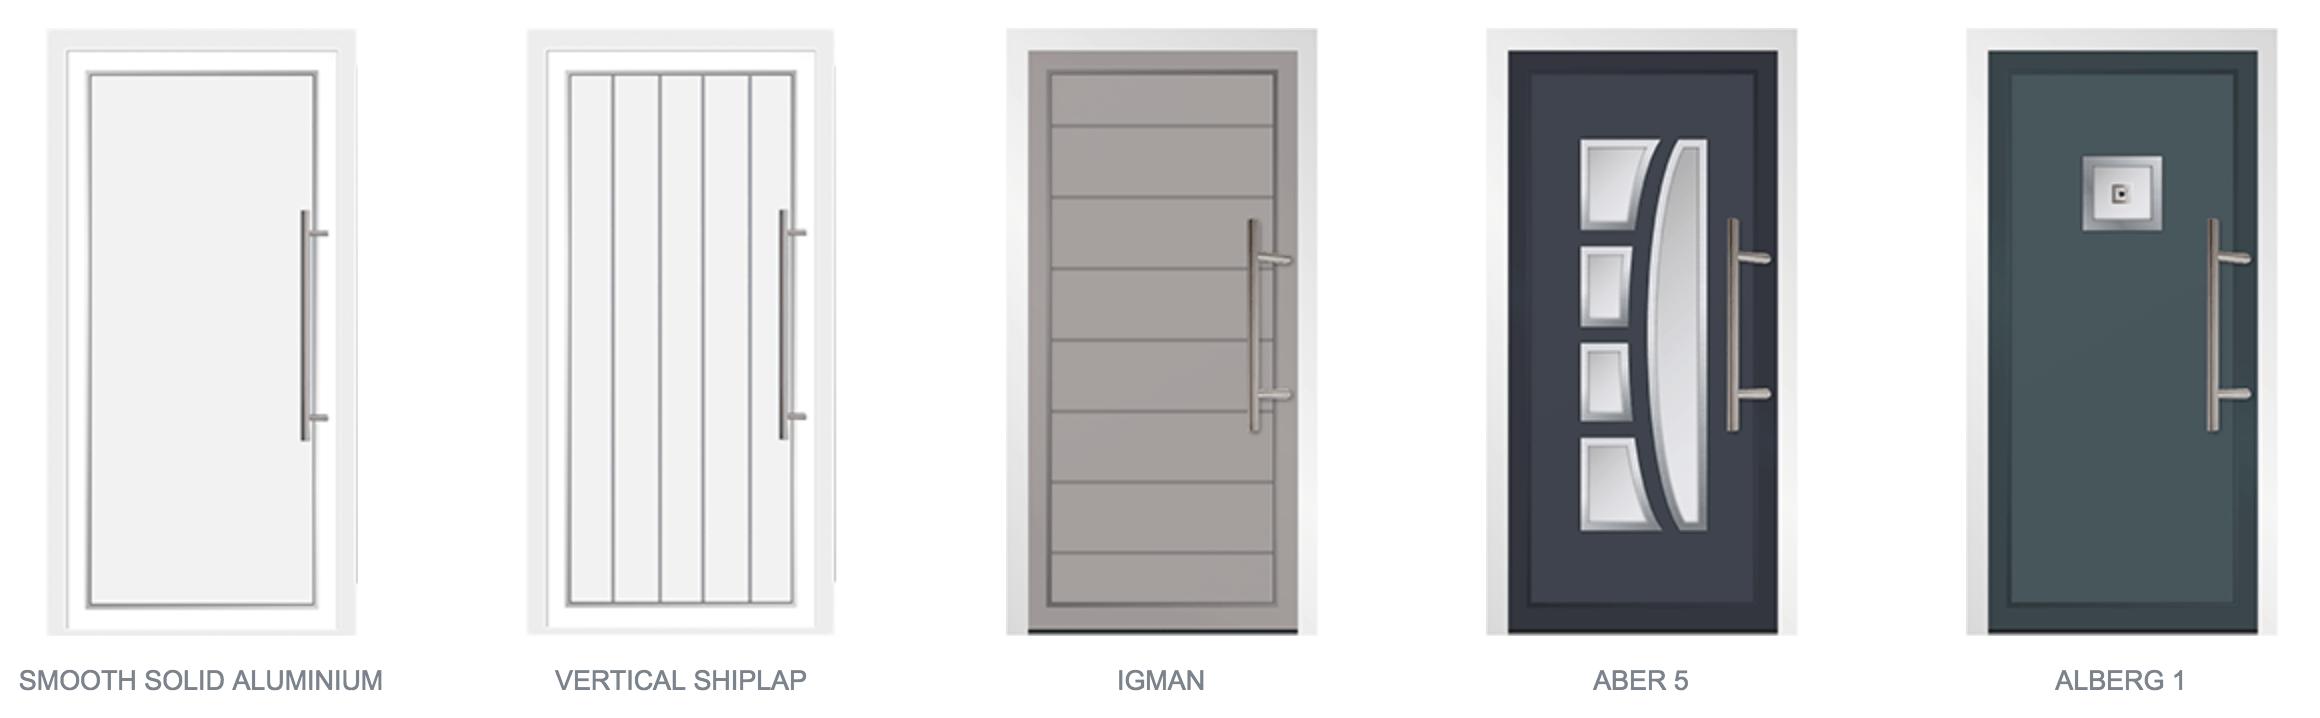 Aluminium Door Styles01